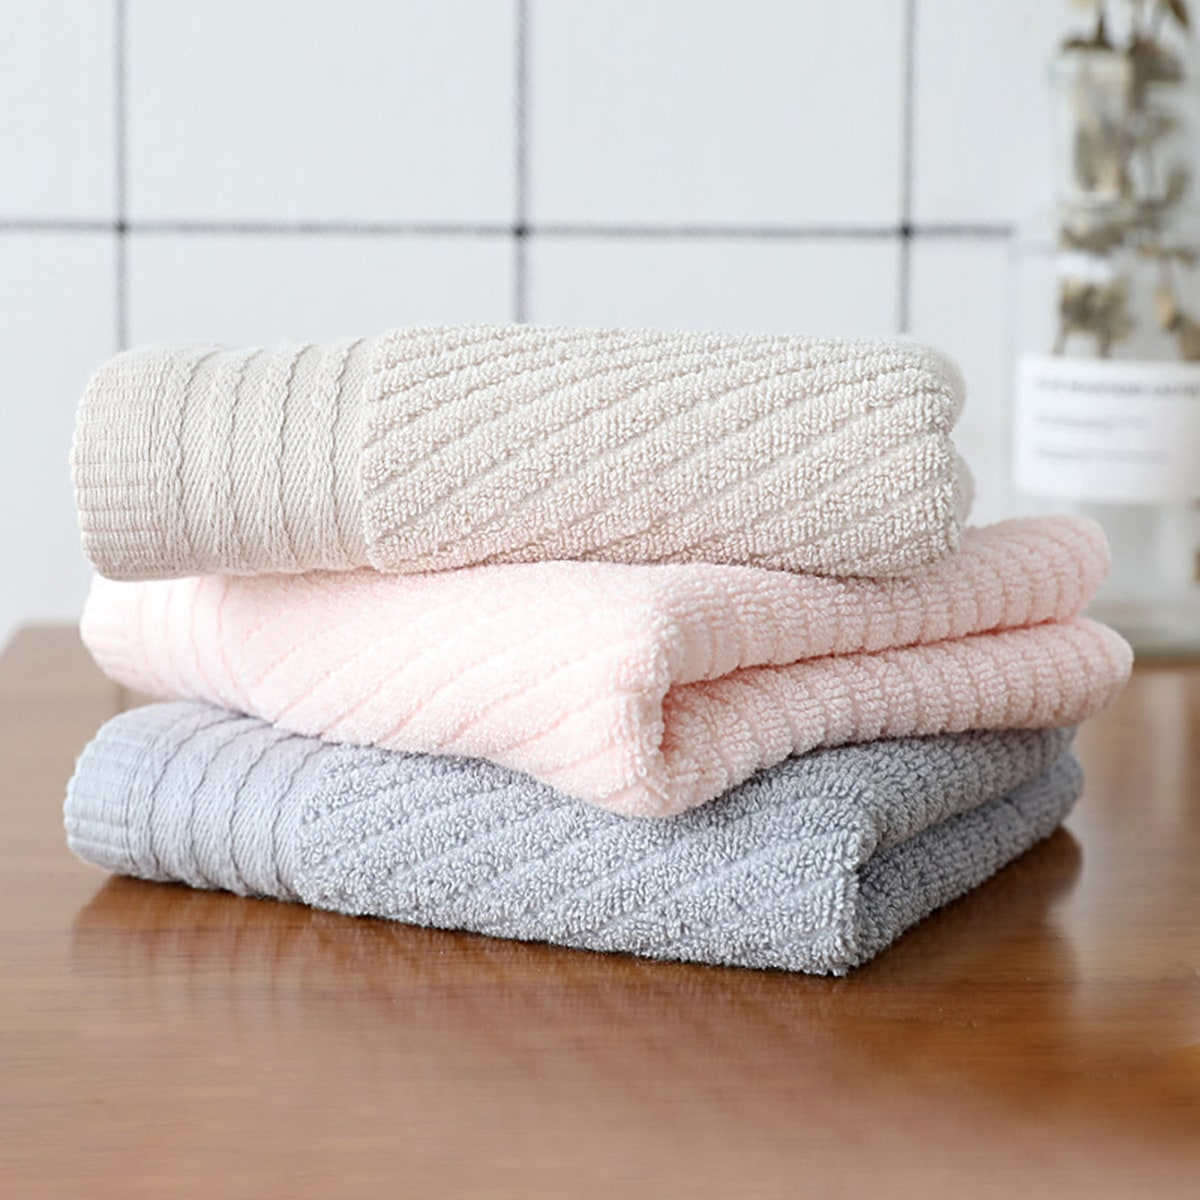 1 st vast absorberende handdoek